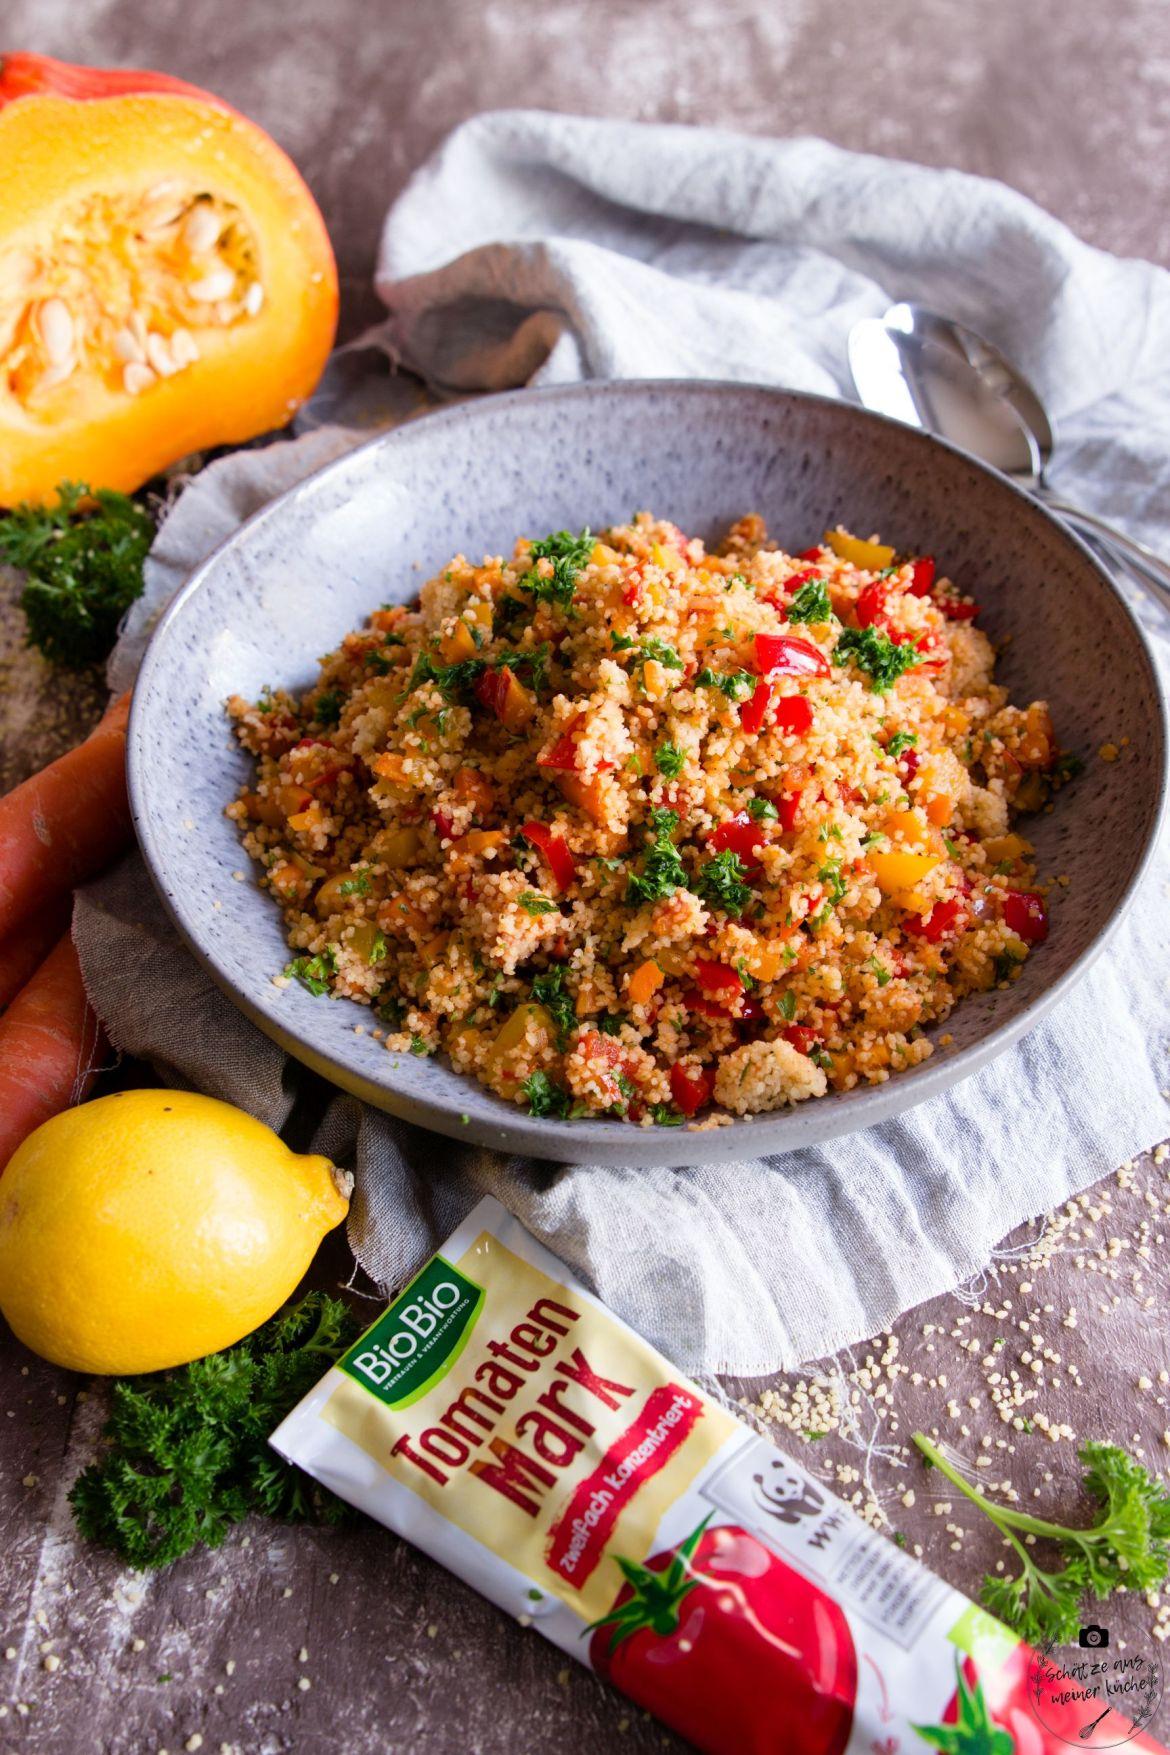 Couscous-Salat mit buntem Herbstgemüse